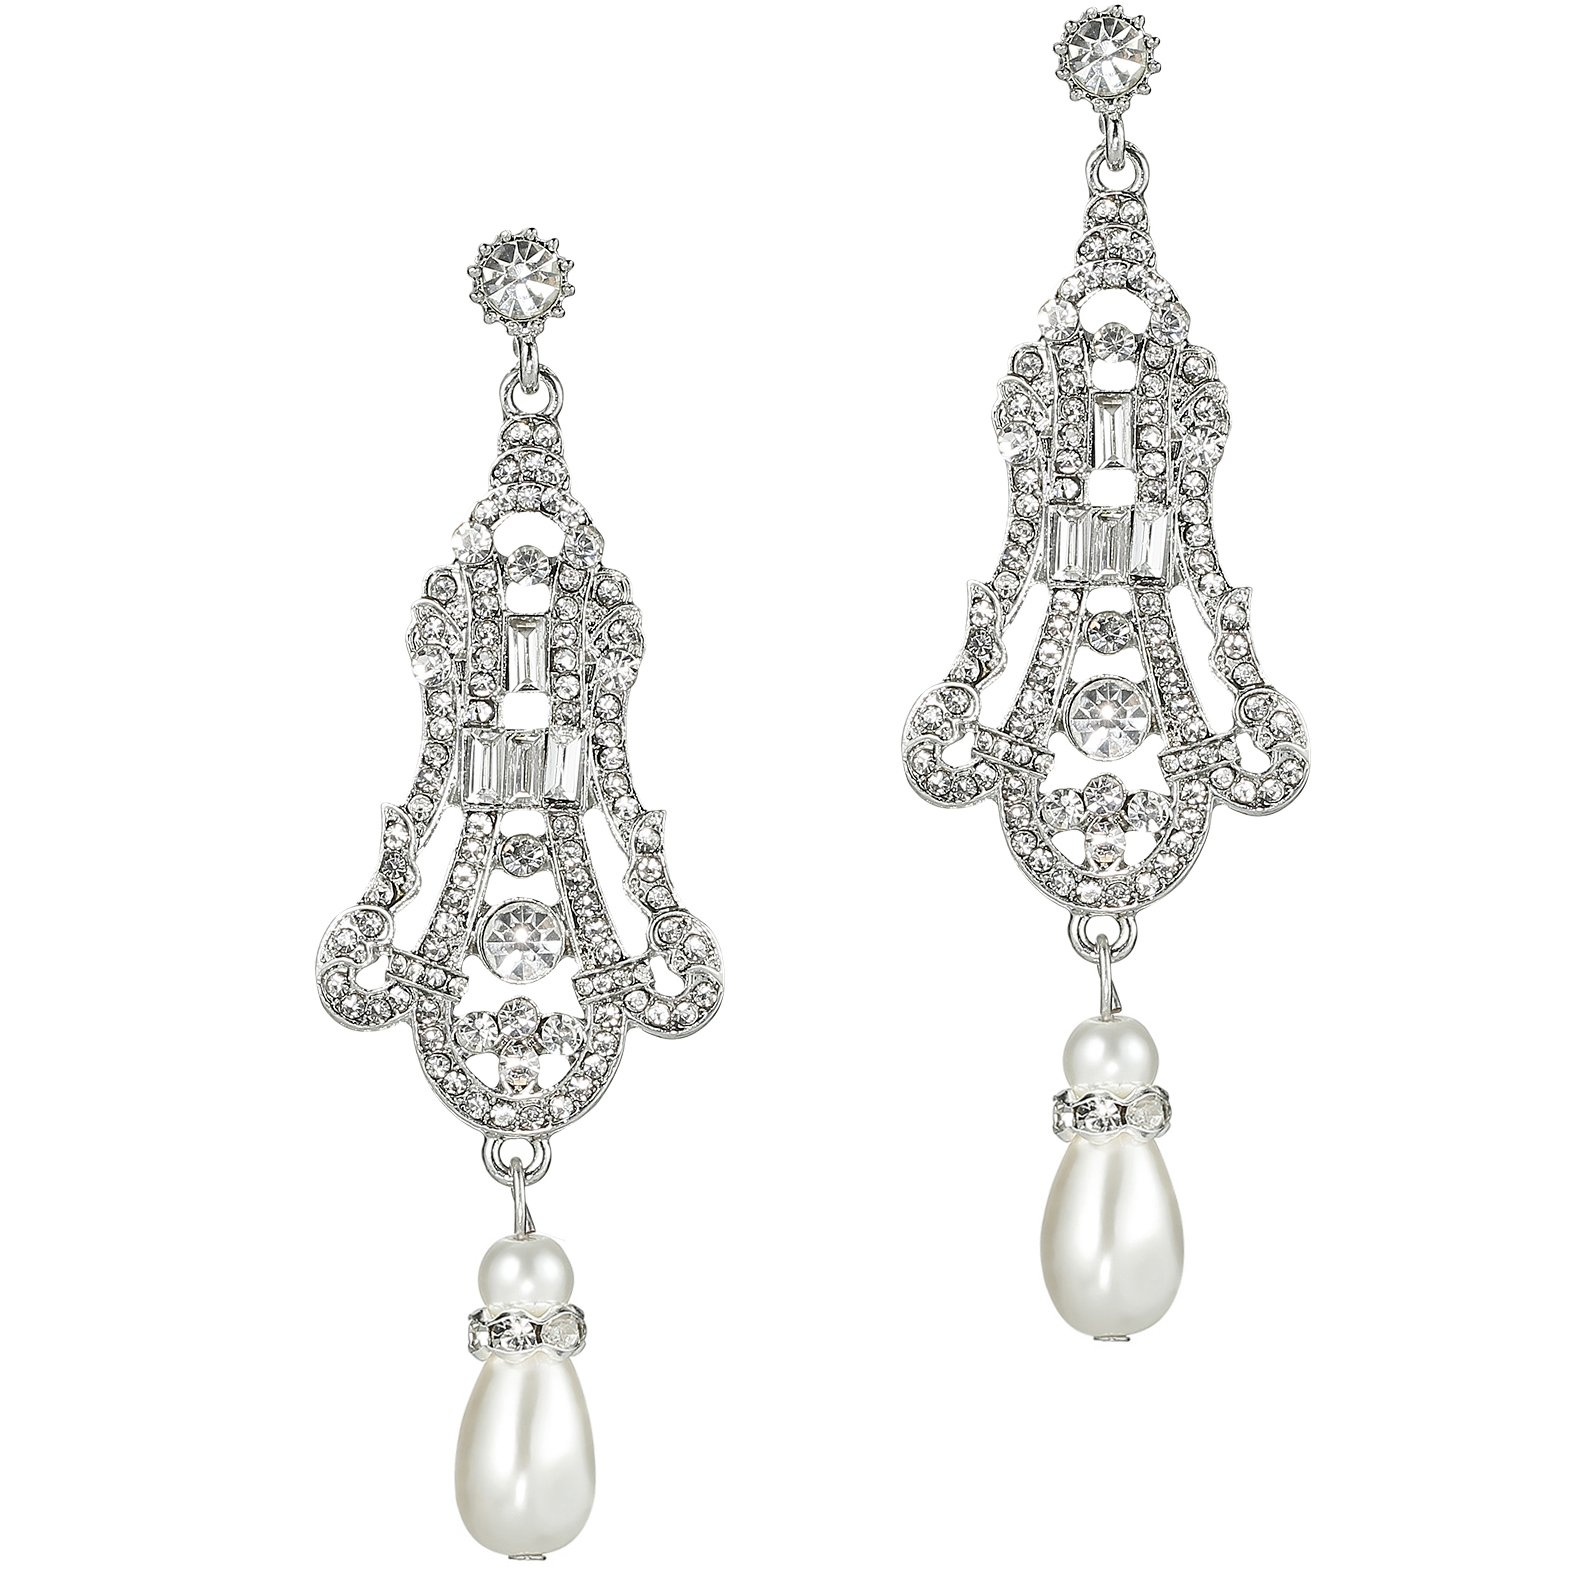 BABEYOND 1920s Flapper Art Deco Gatsby Earrings 20s Flapper Gatsby Accessories